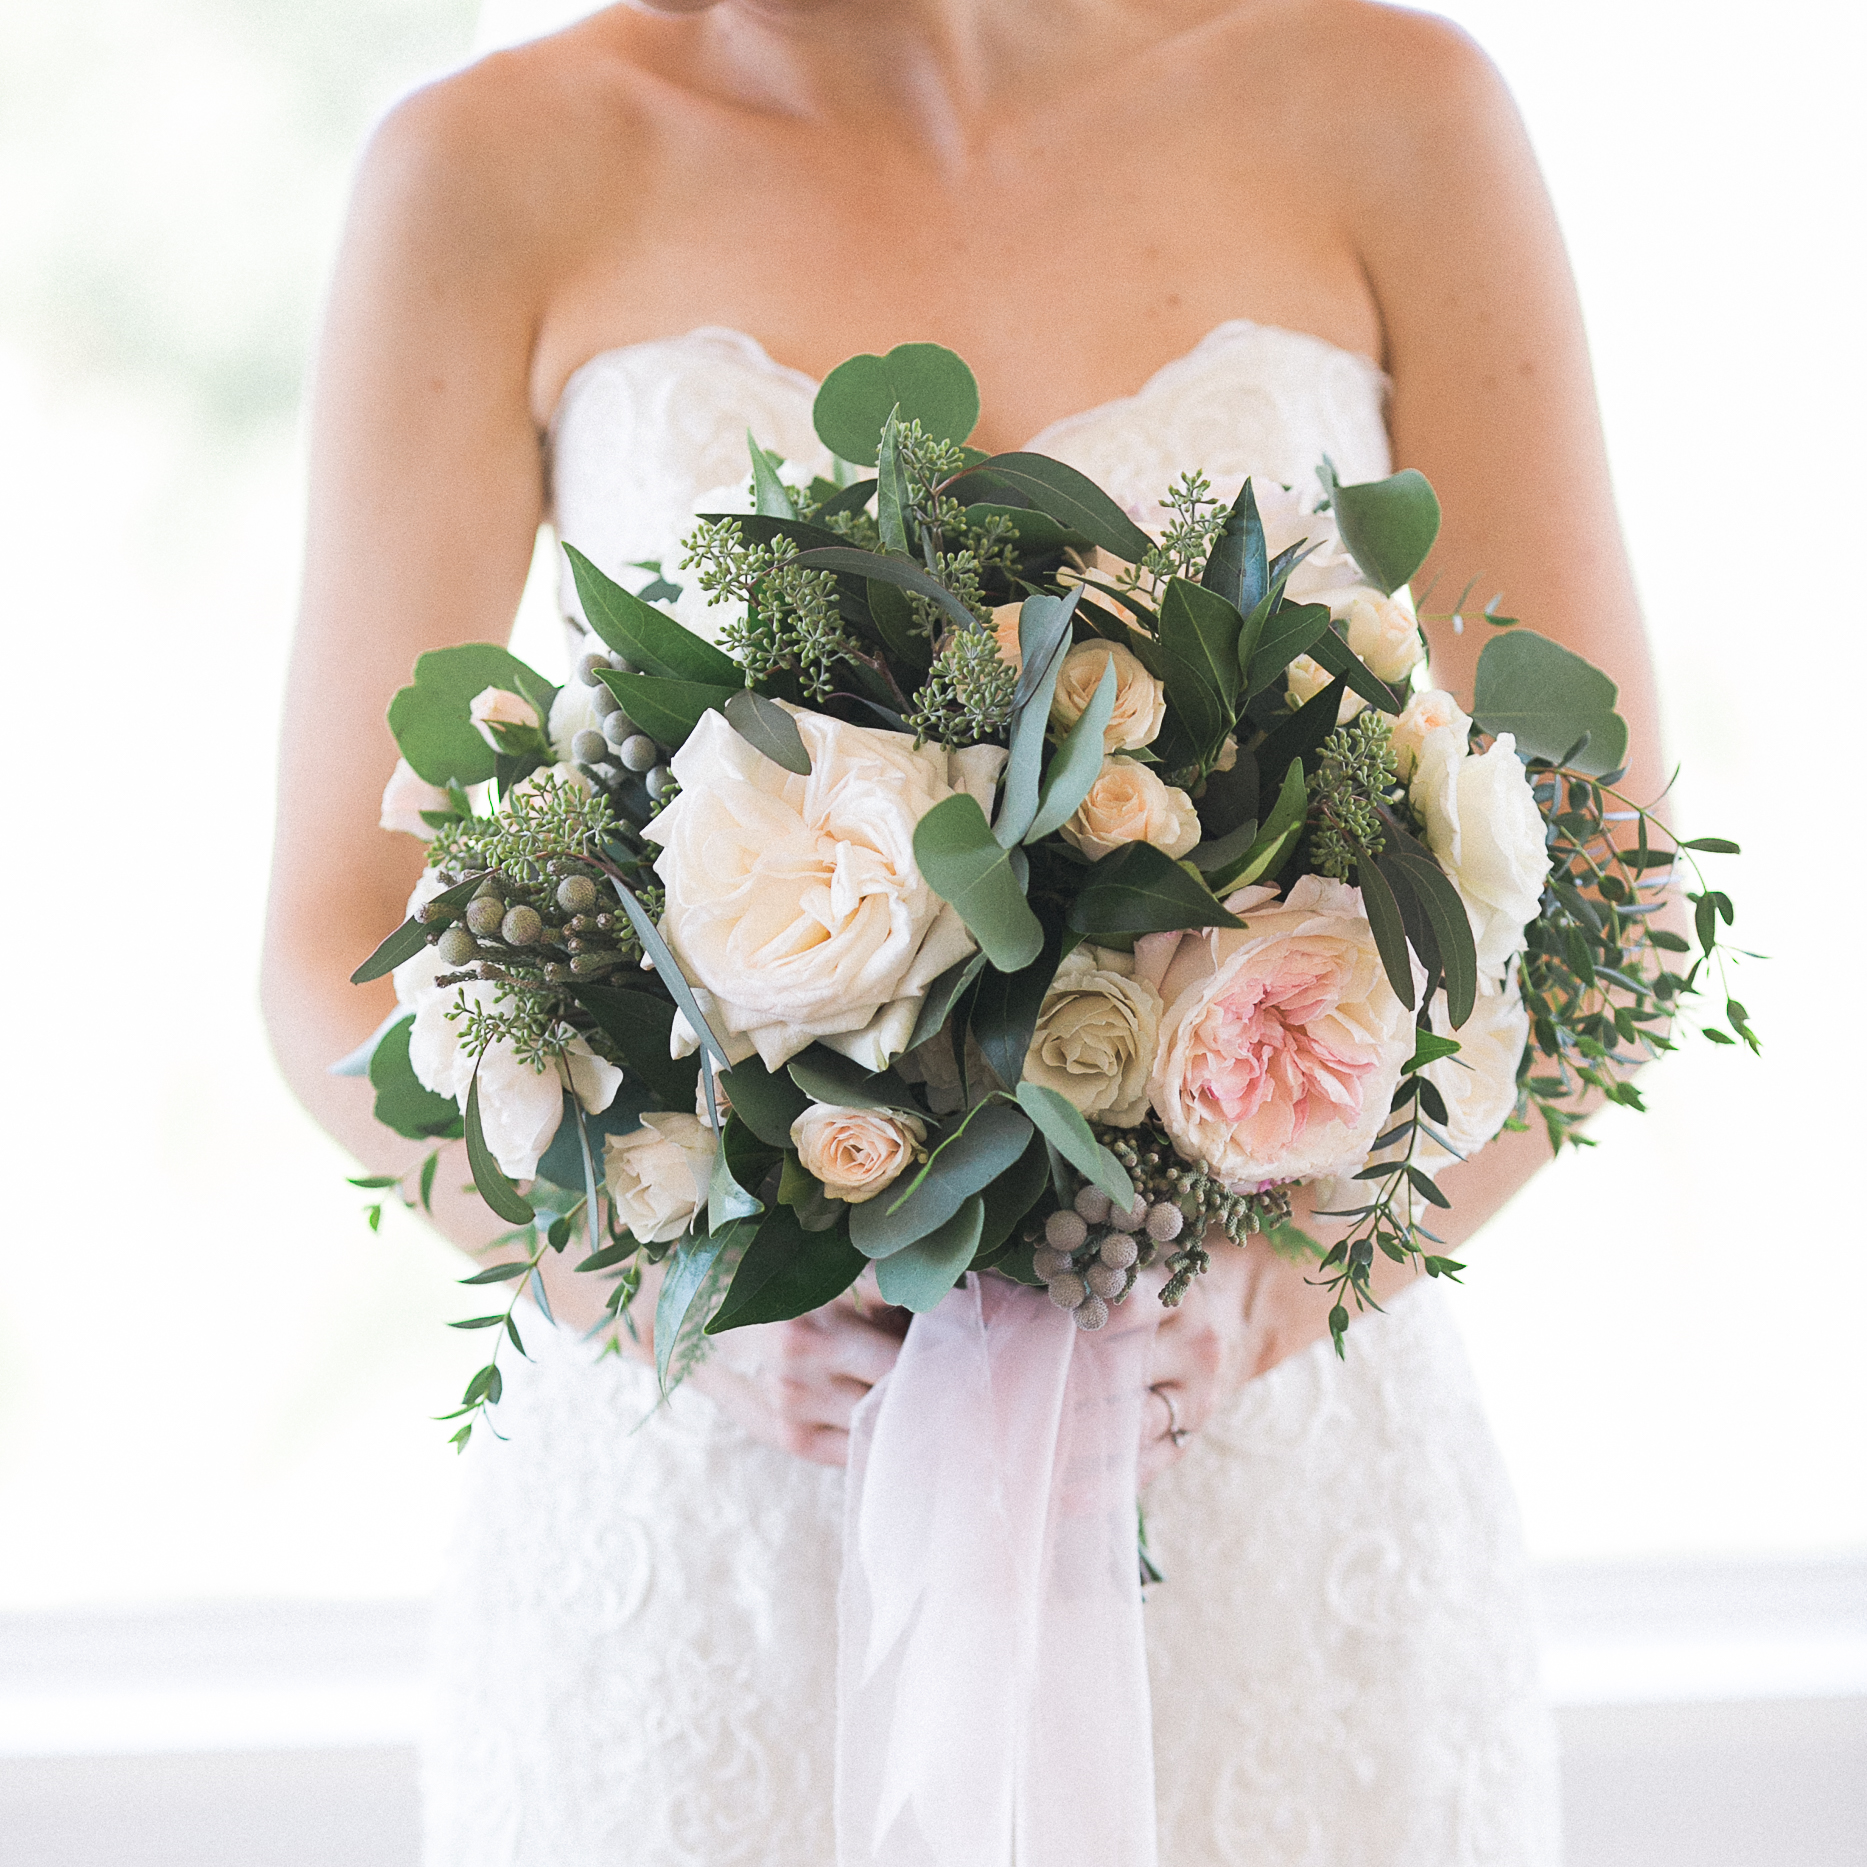 Carmel Mountain Ranch Country Club Blush & ivory, garden romantic bridal bouquet by San Diego wedding florist, Compass Floral. Brandi Welles Photography.